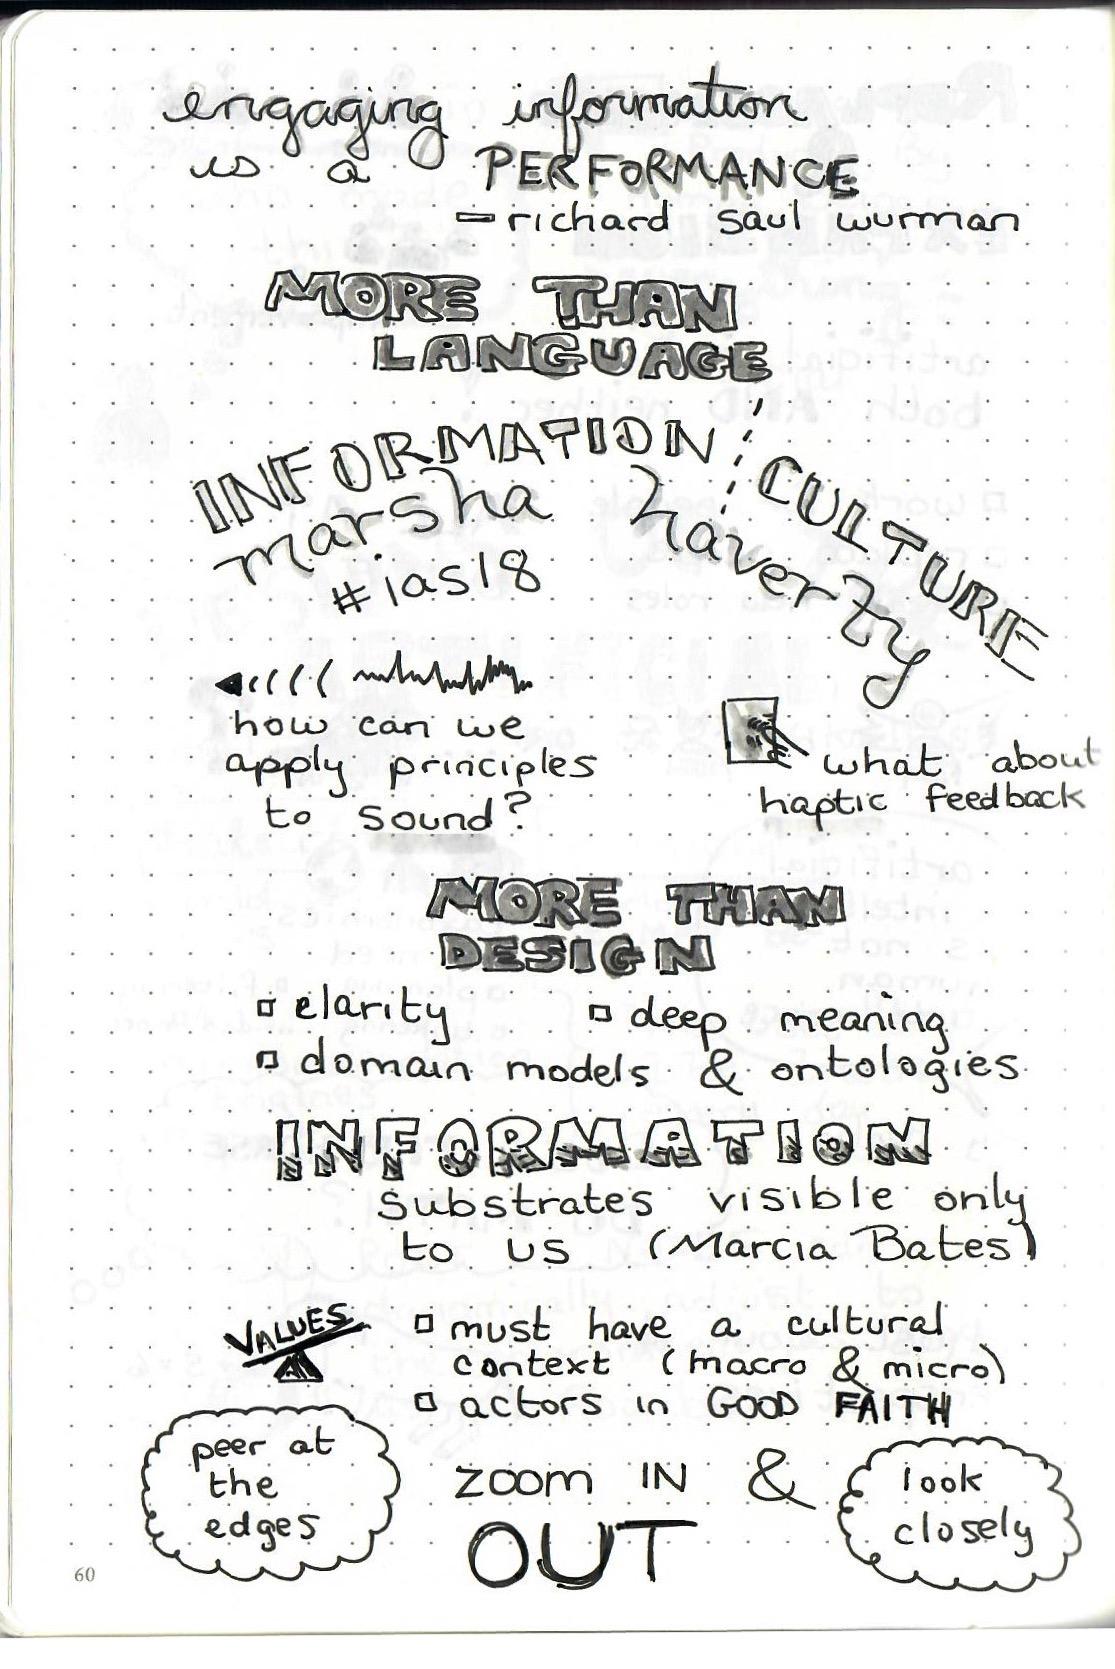 Informatio Culture (Marsha Haverty).jpg